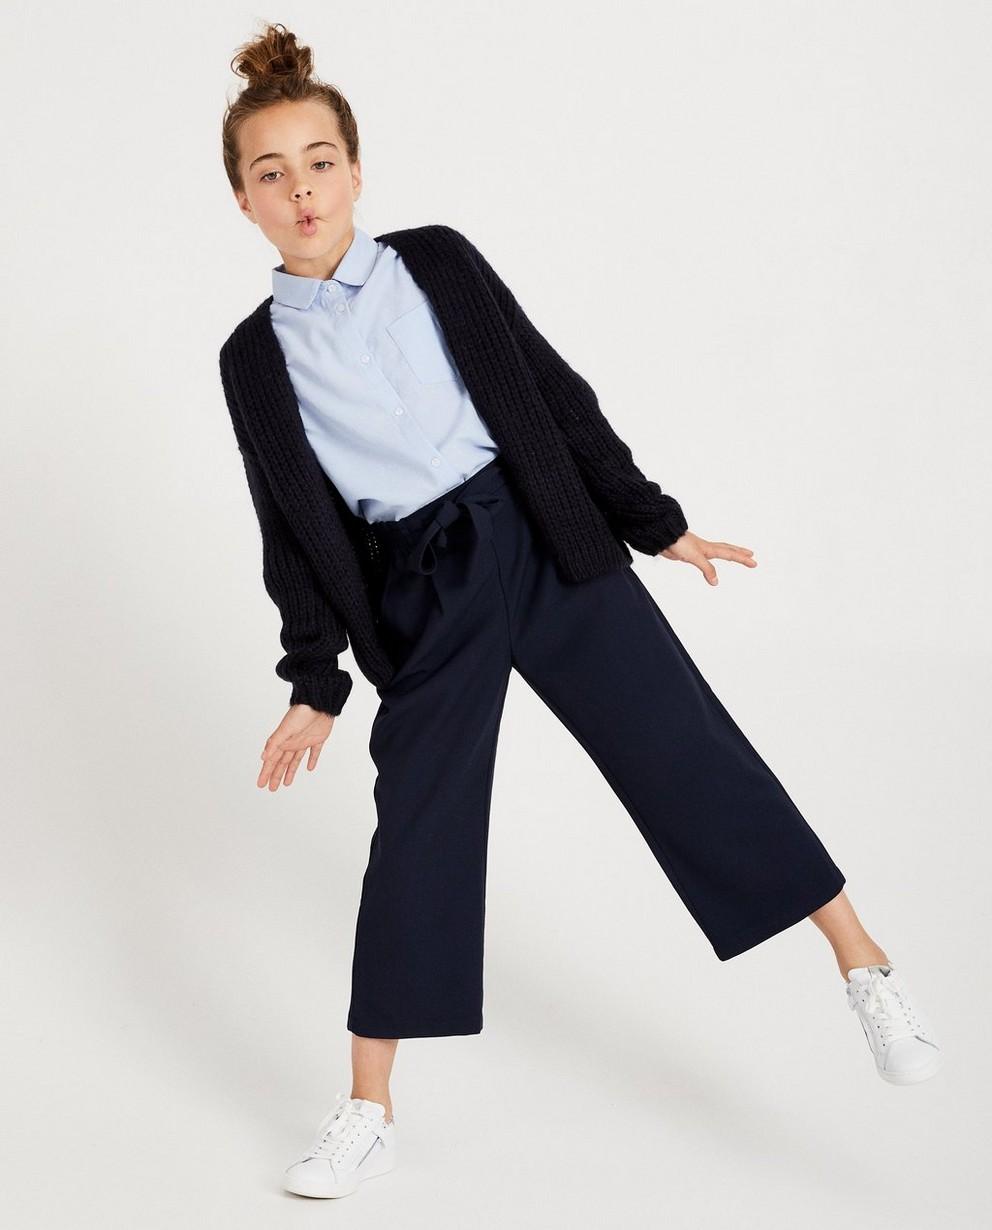 Cardigan bleu marine - tricot à grosses mailles - JBC